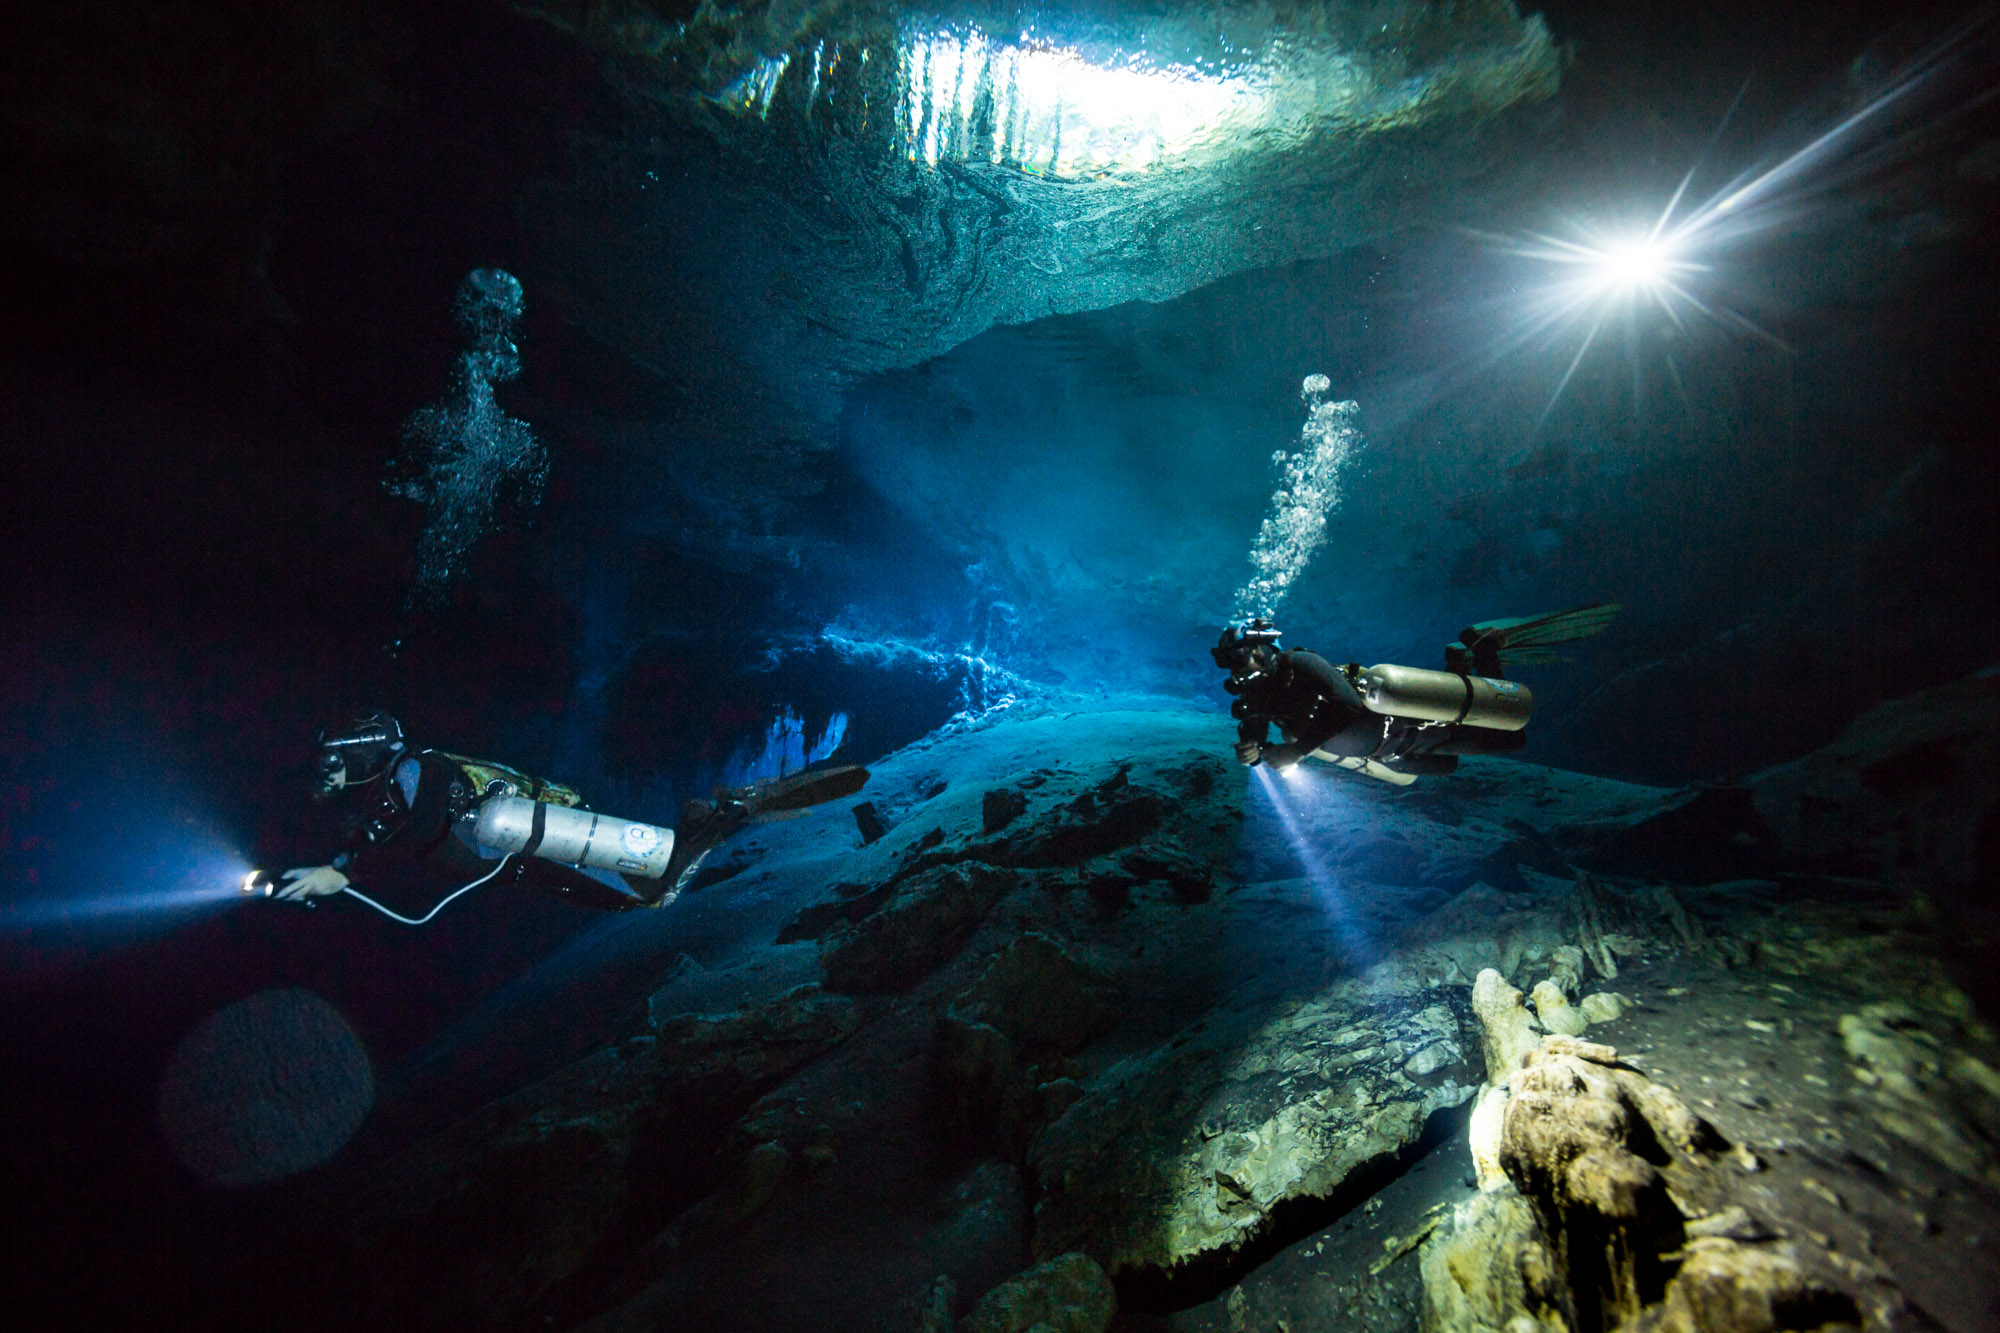 Aven Cavern